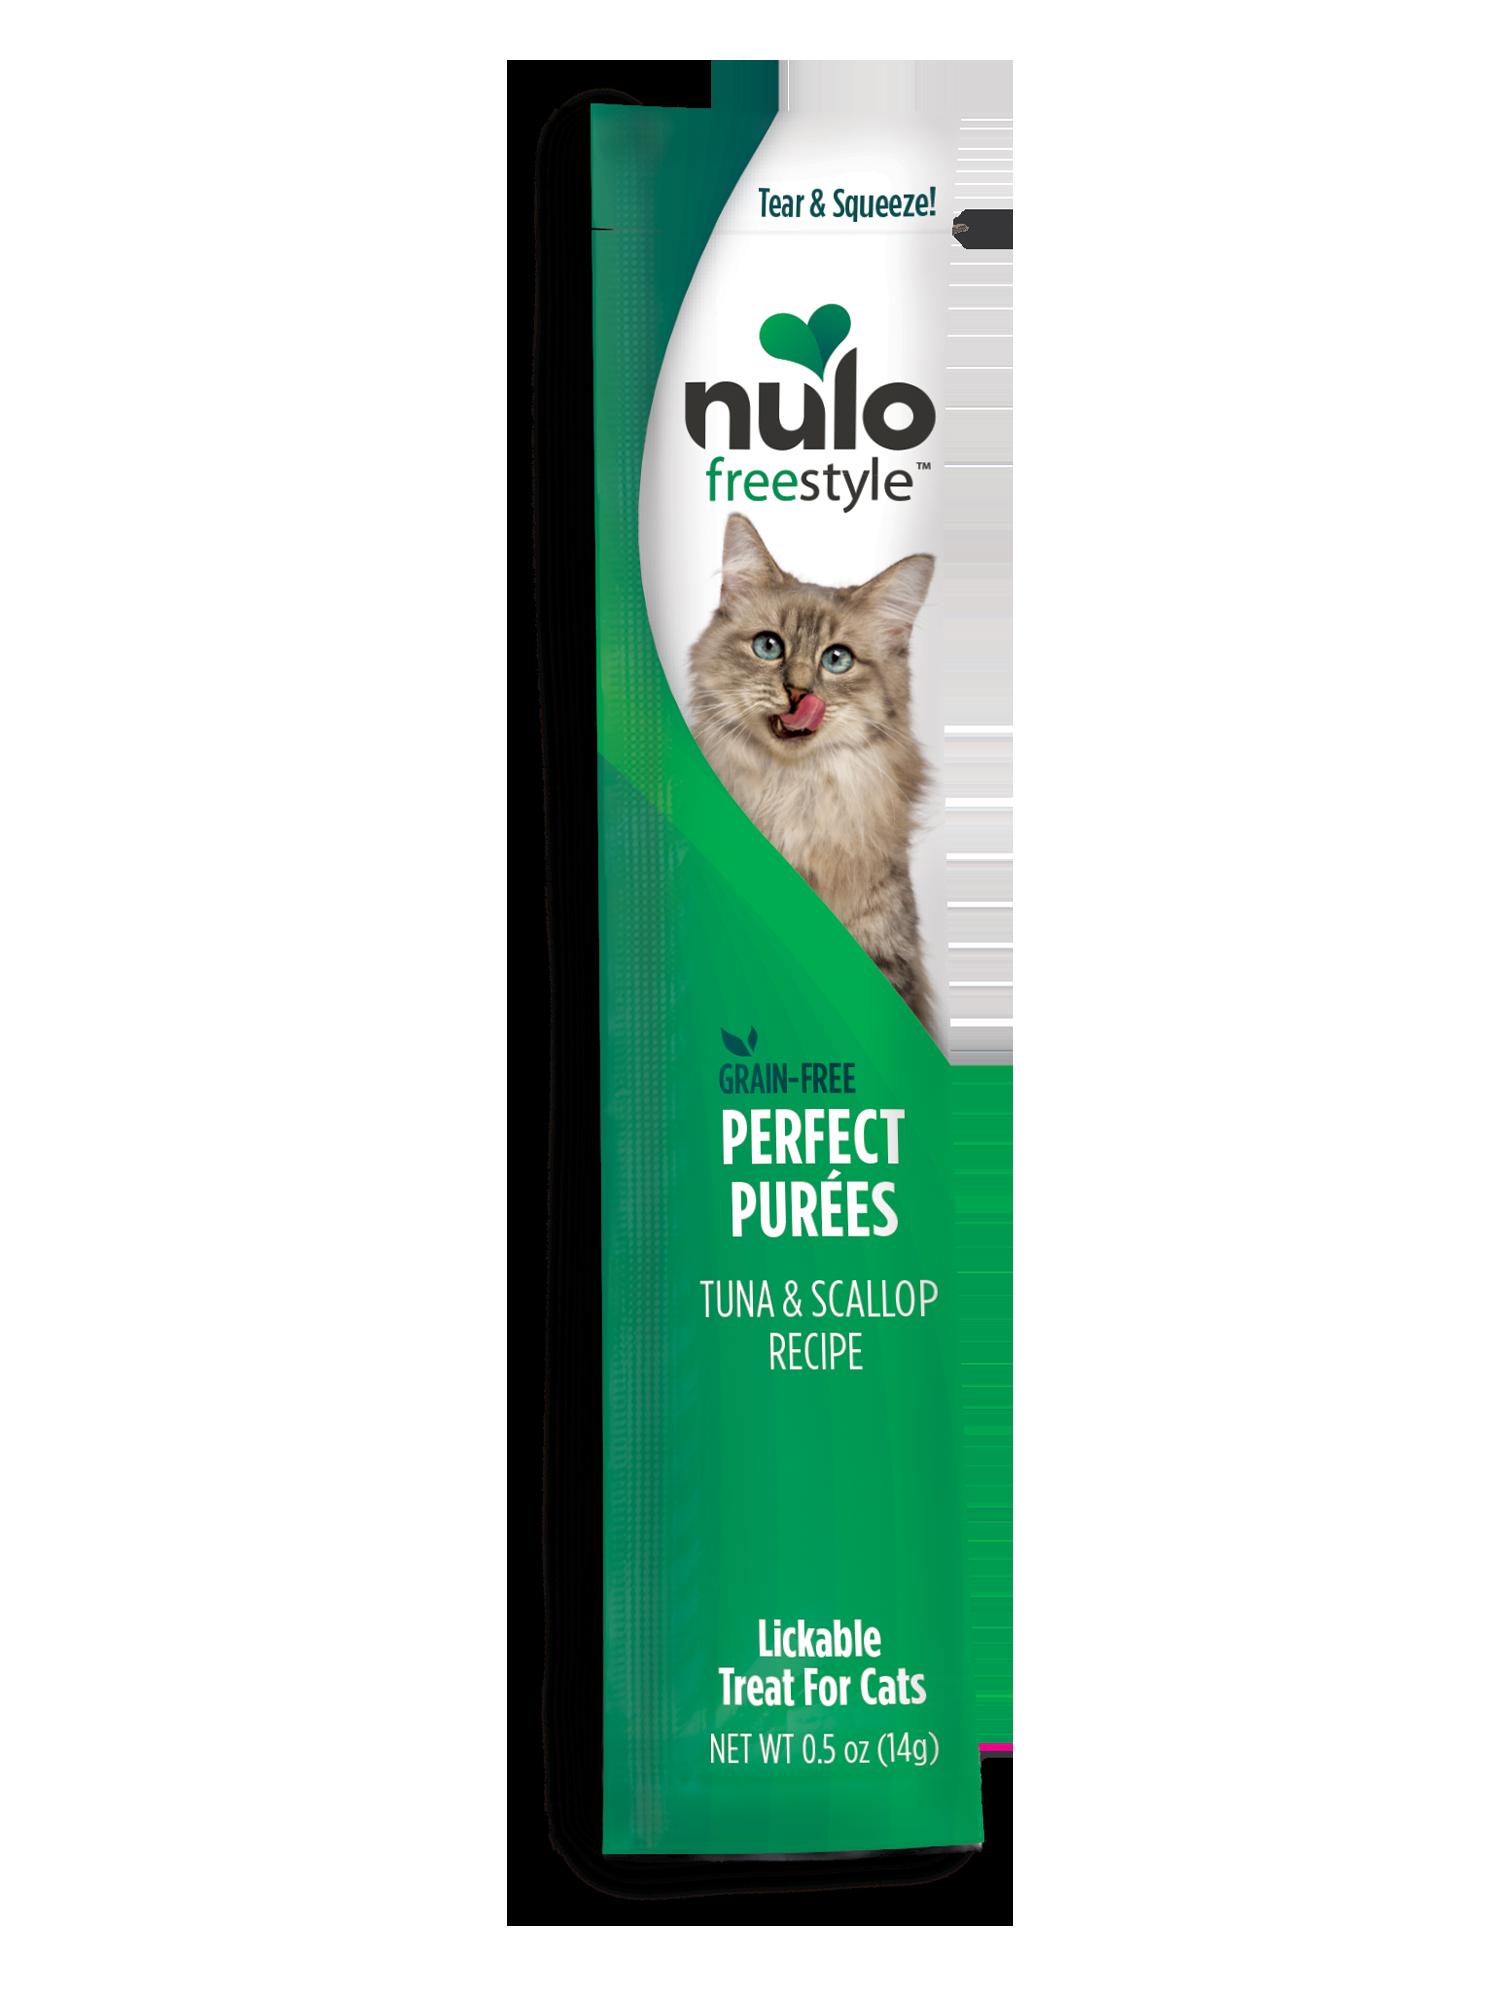 Nulo Nulo Freestyle Perfect Purees Tuna & Scallop Cat Treat 0.5oz